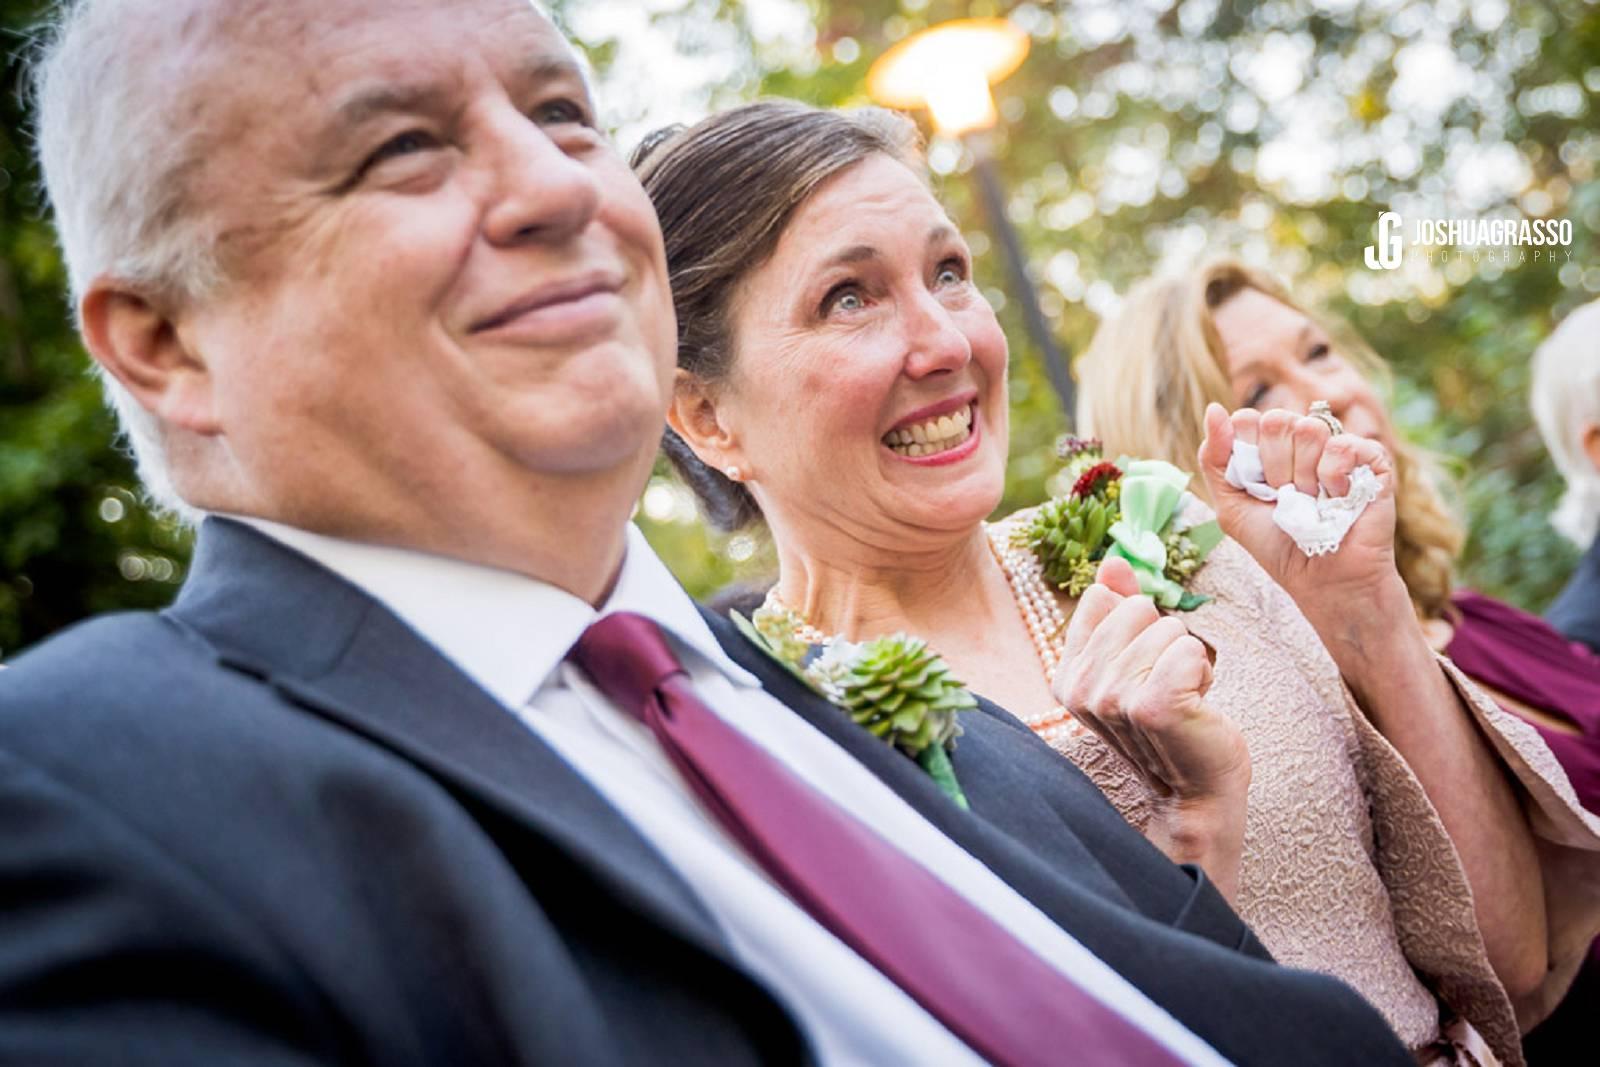 Best-Atlanta-wedding-Photographer-2018-Joshua-Grasso (36 of 54)